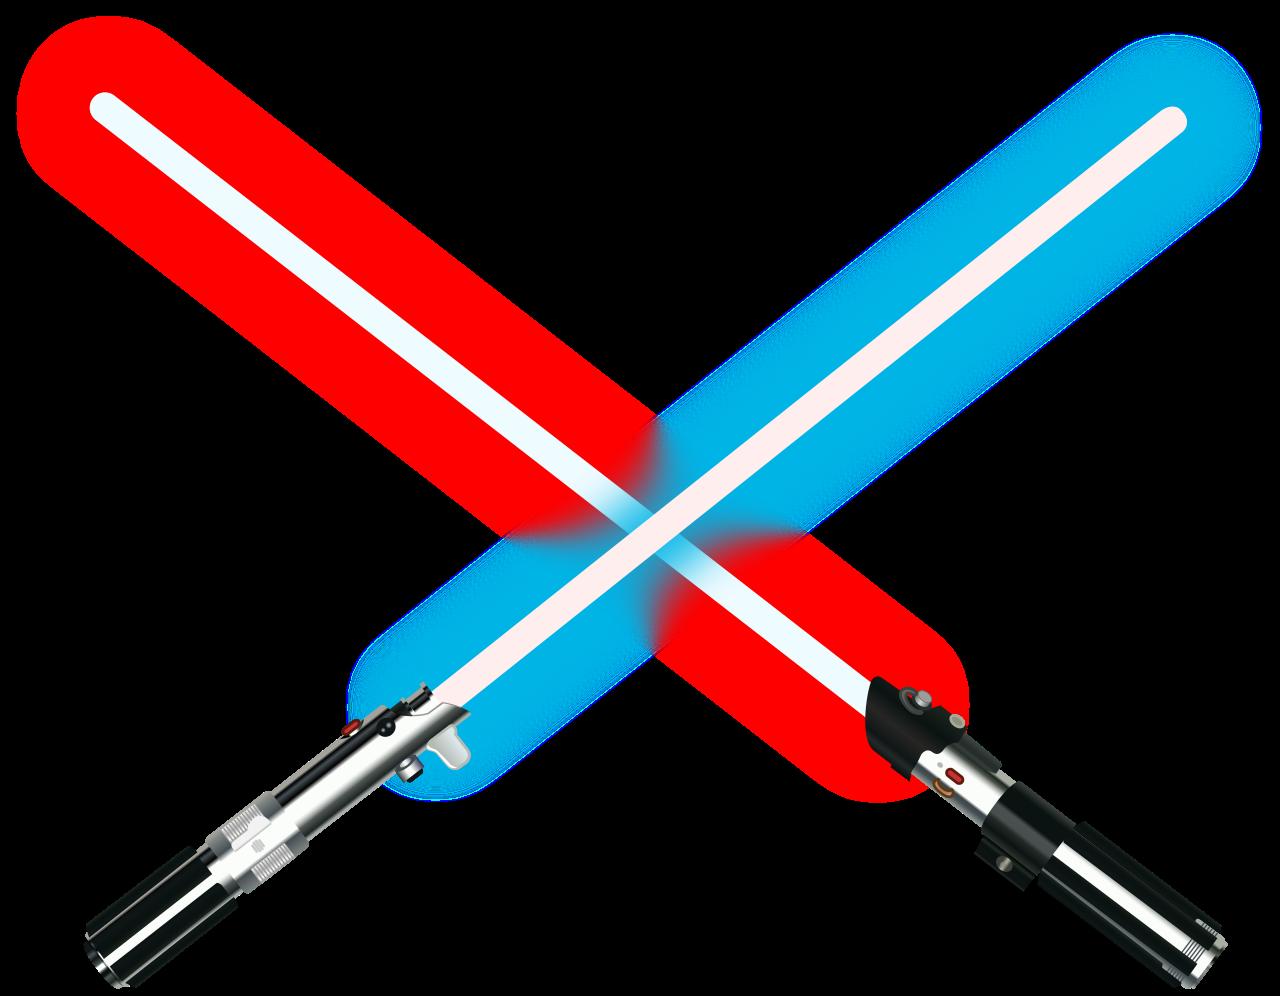 Lightsaber Star Wars General Grievous Jedi.